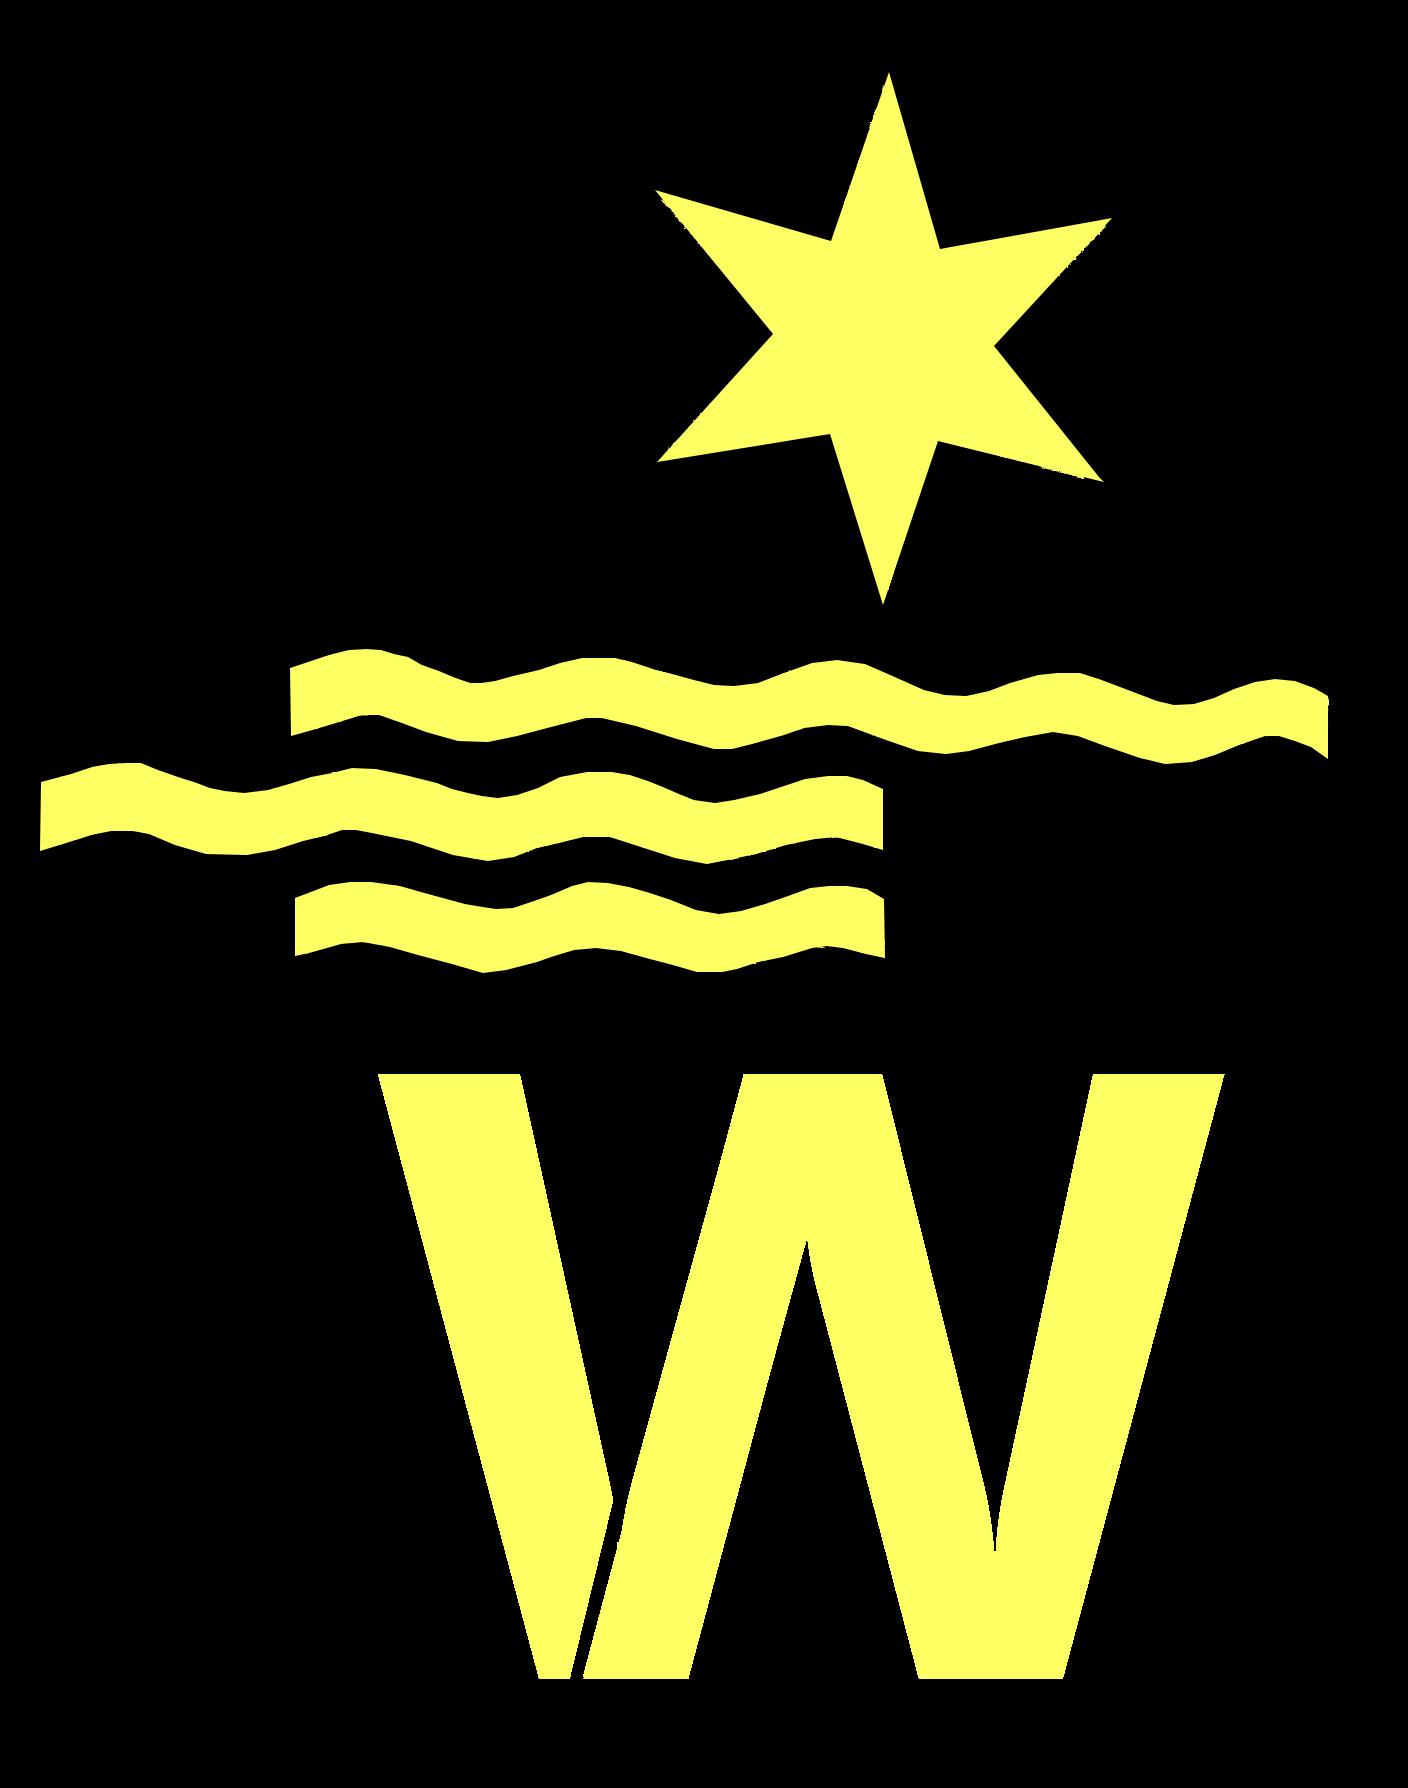 wn-logo-tshirt-05-w